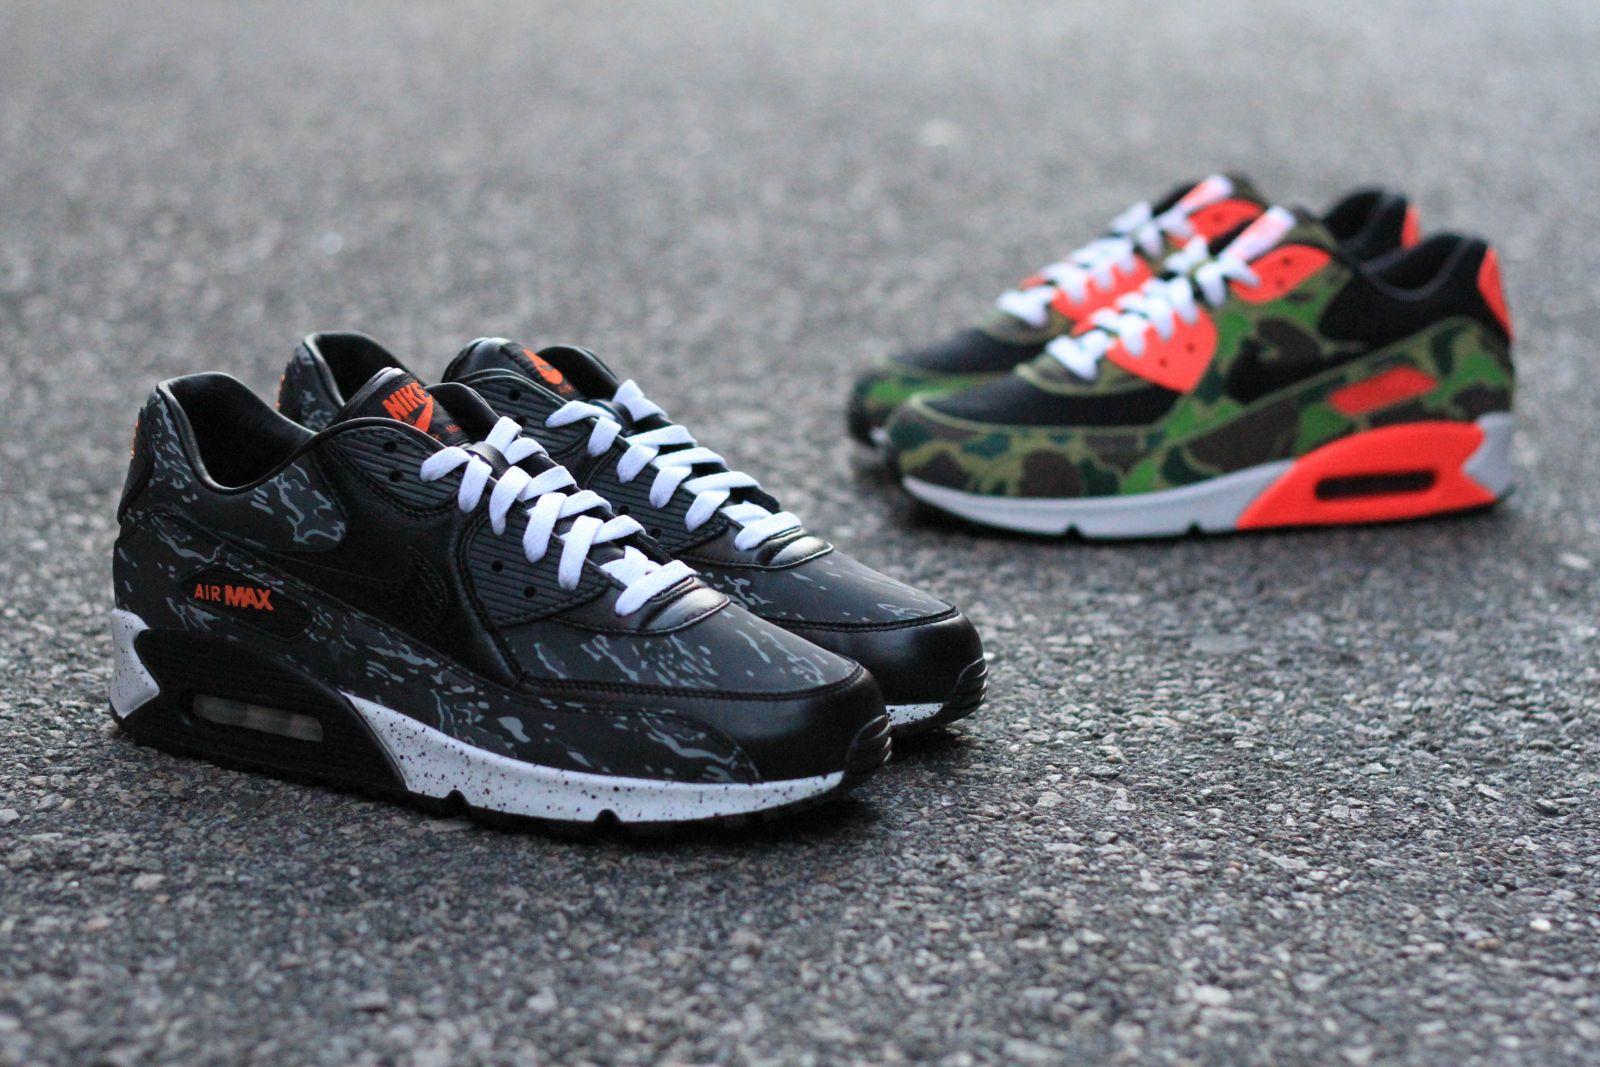 atmos x Nike Air Max 90  Premium Camo Pack  - Available at Bodega ... 0f773706b